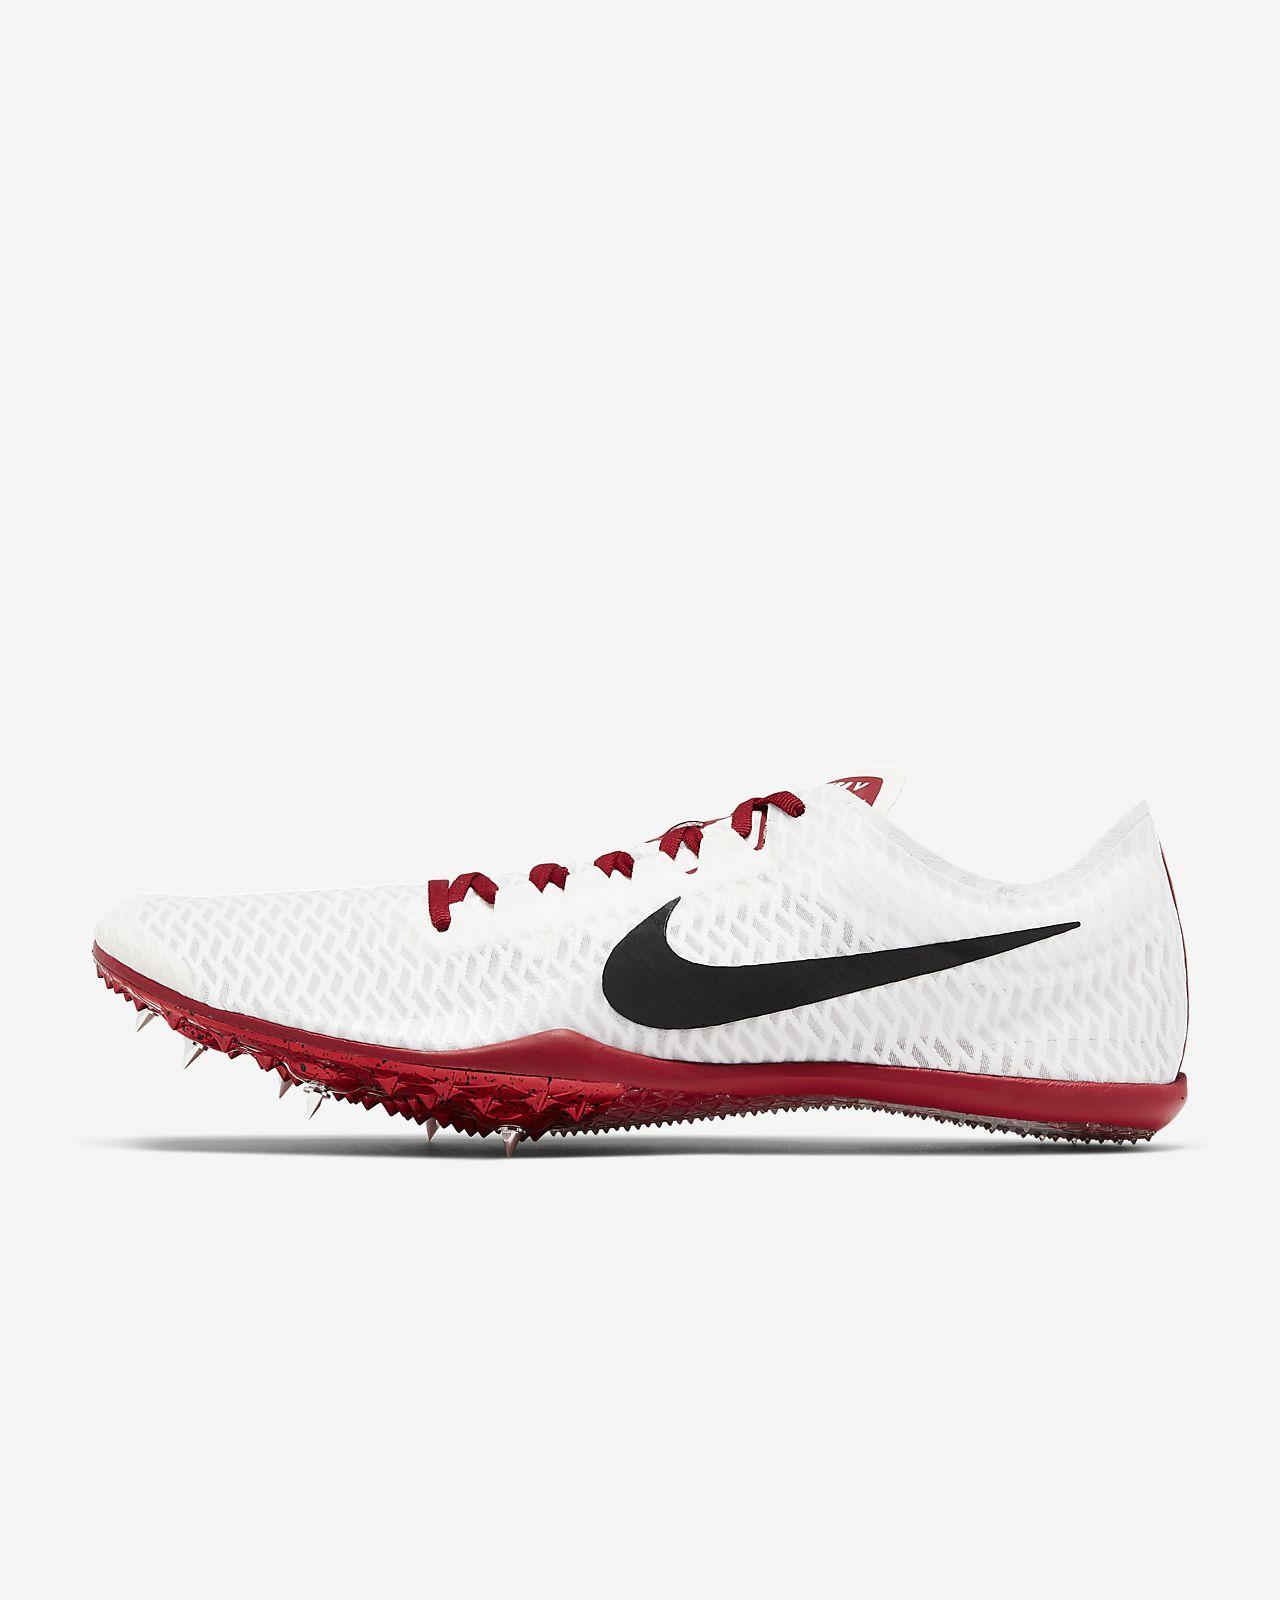 Nike Zoom Mamba 5 Bowerman Track Club Laufschuh